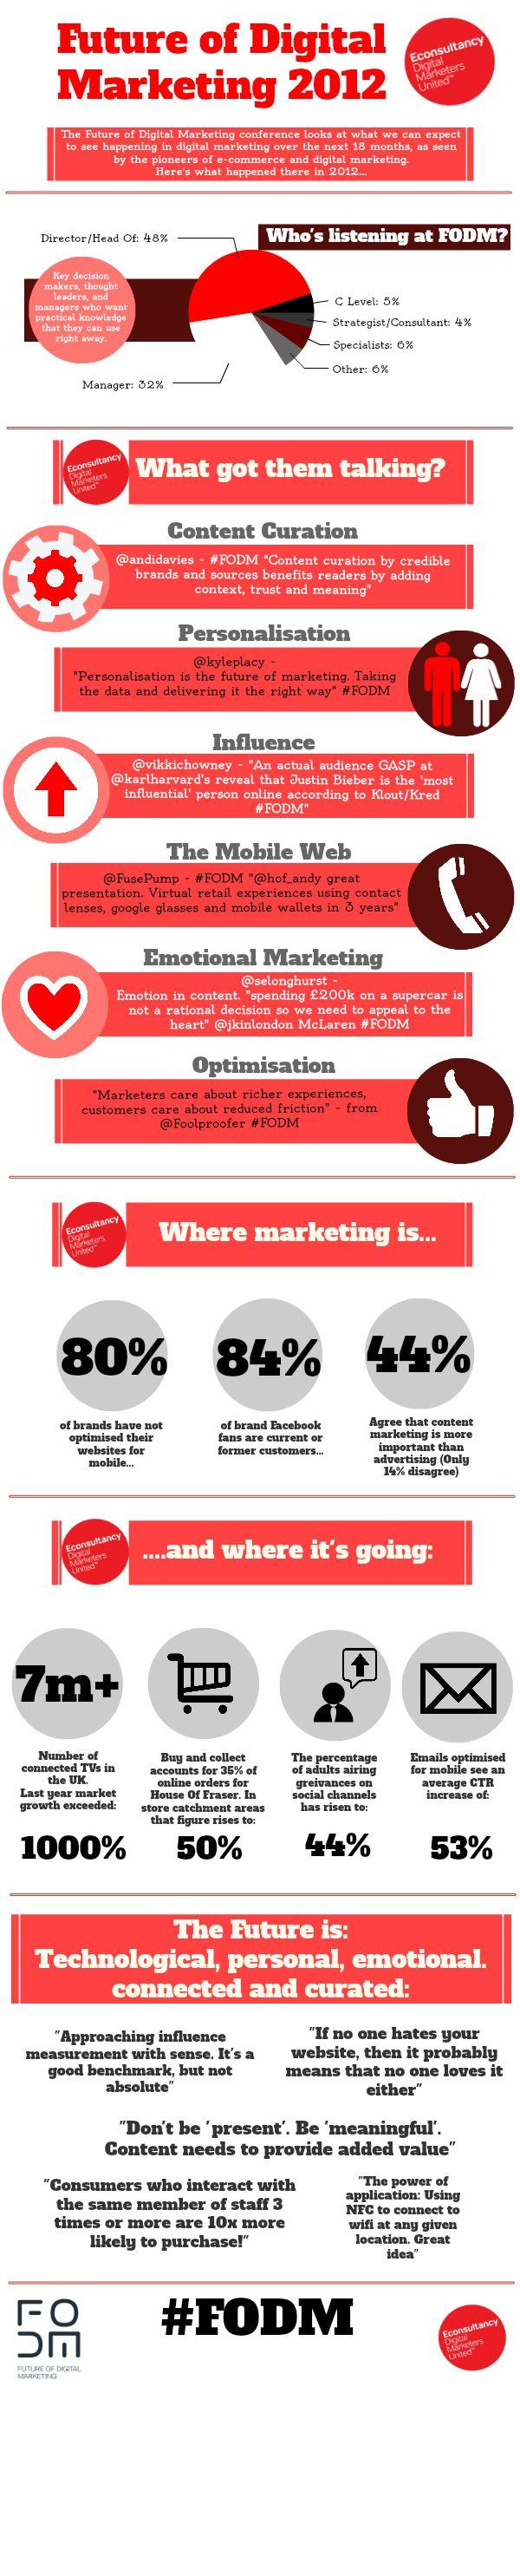 Infographic: Future Of Digital Marketing